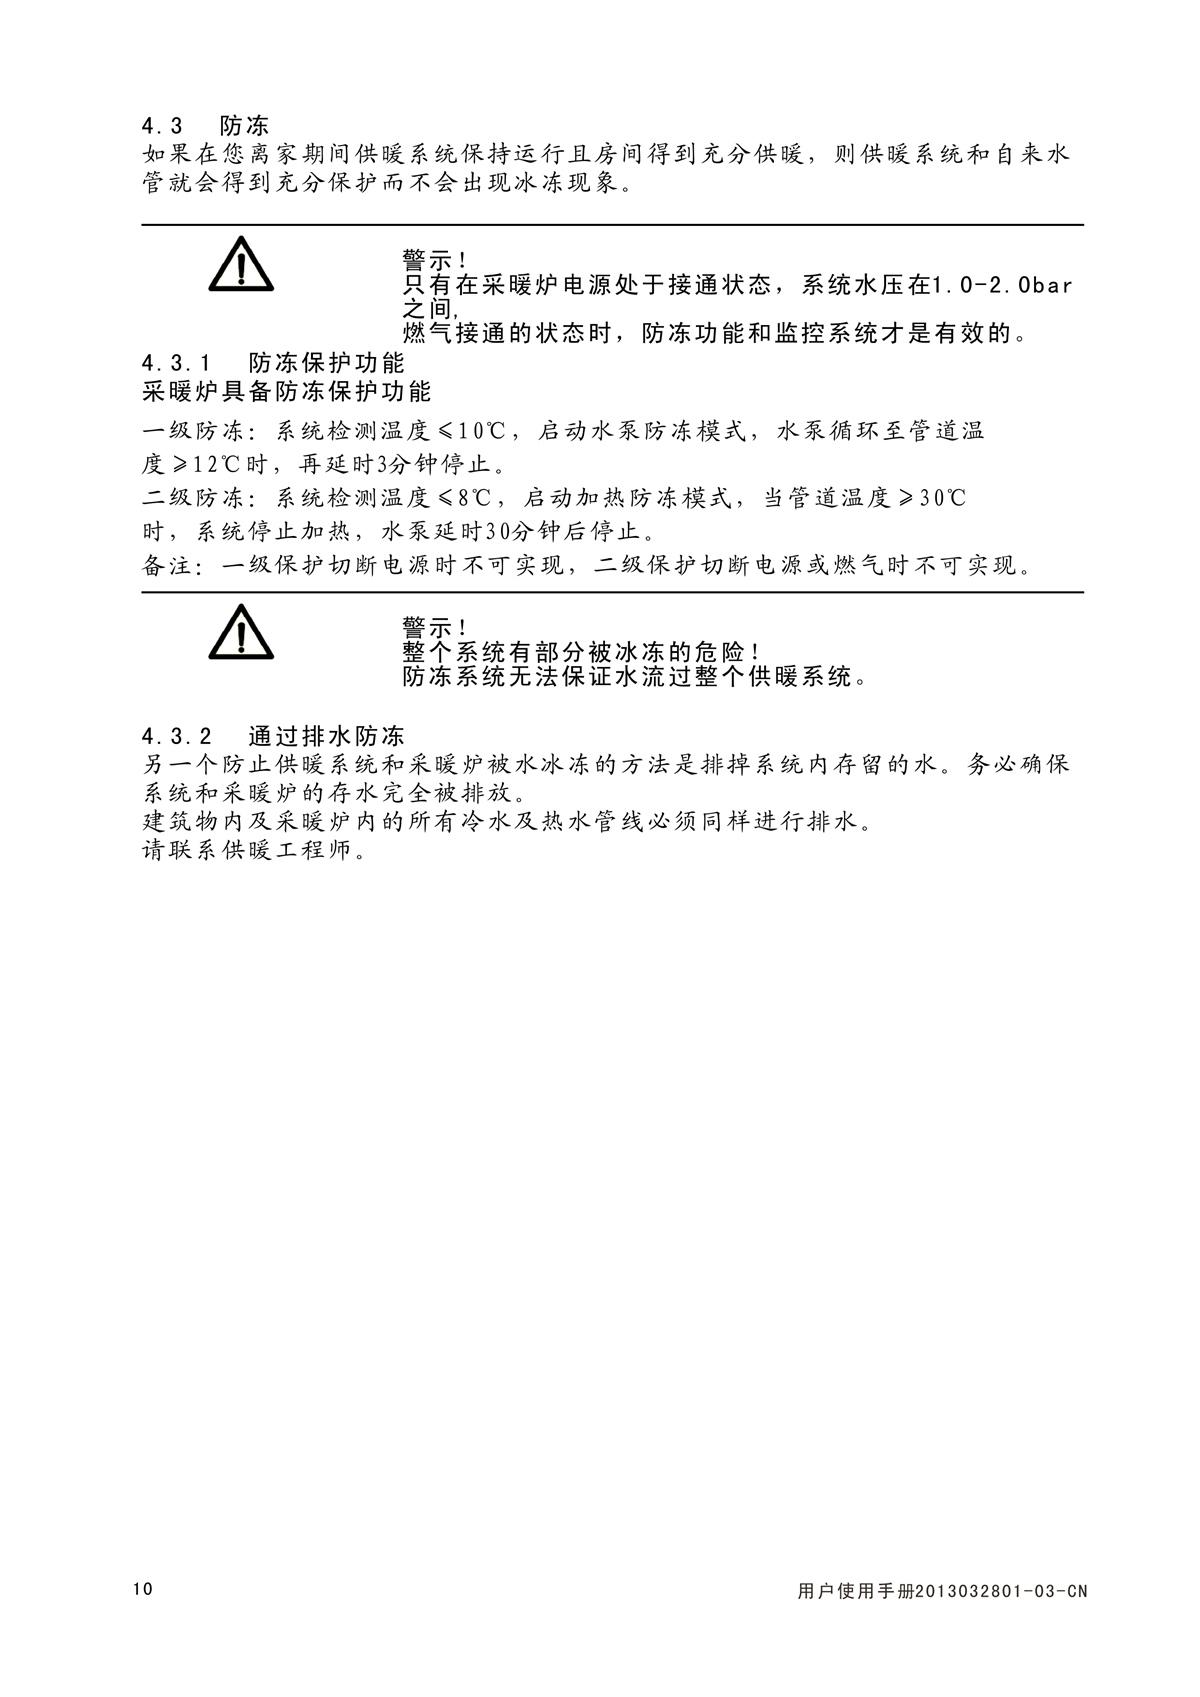 ES02系列-用户使用手册-8_01.jpg